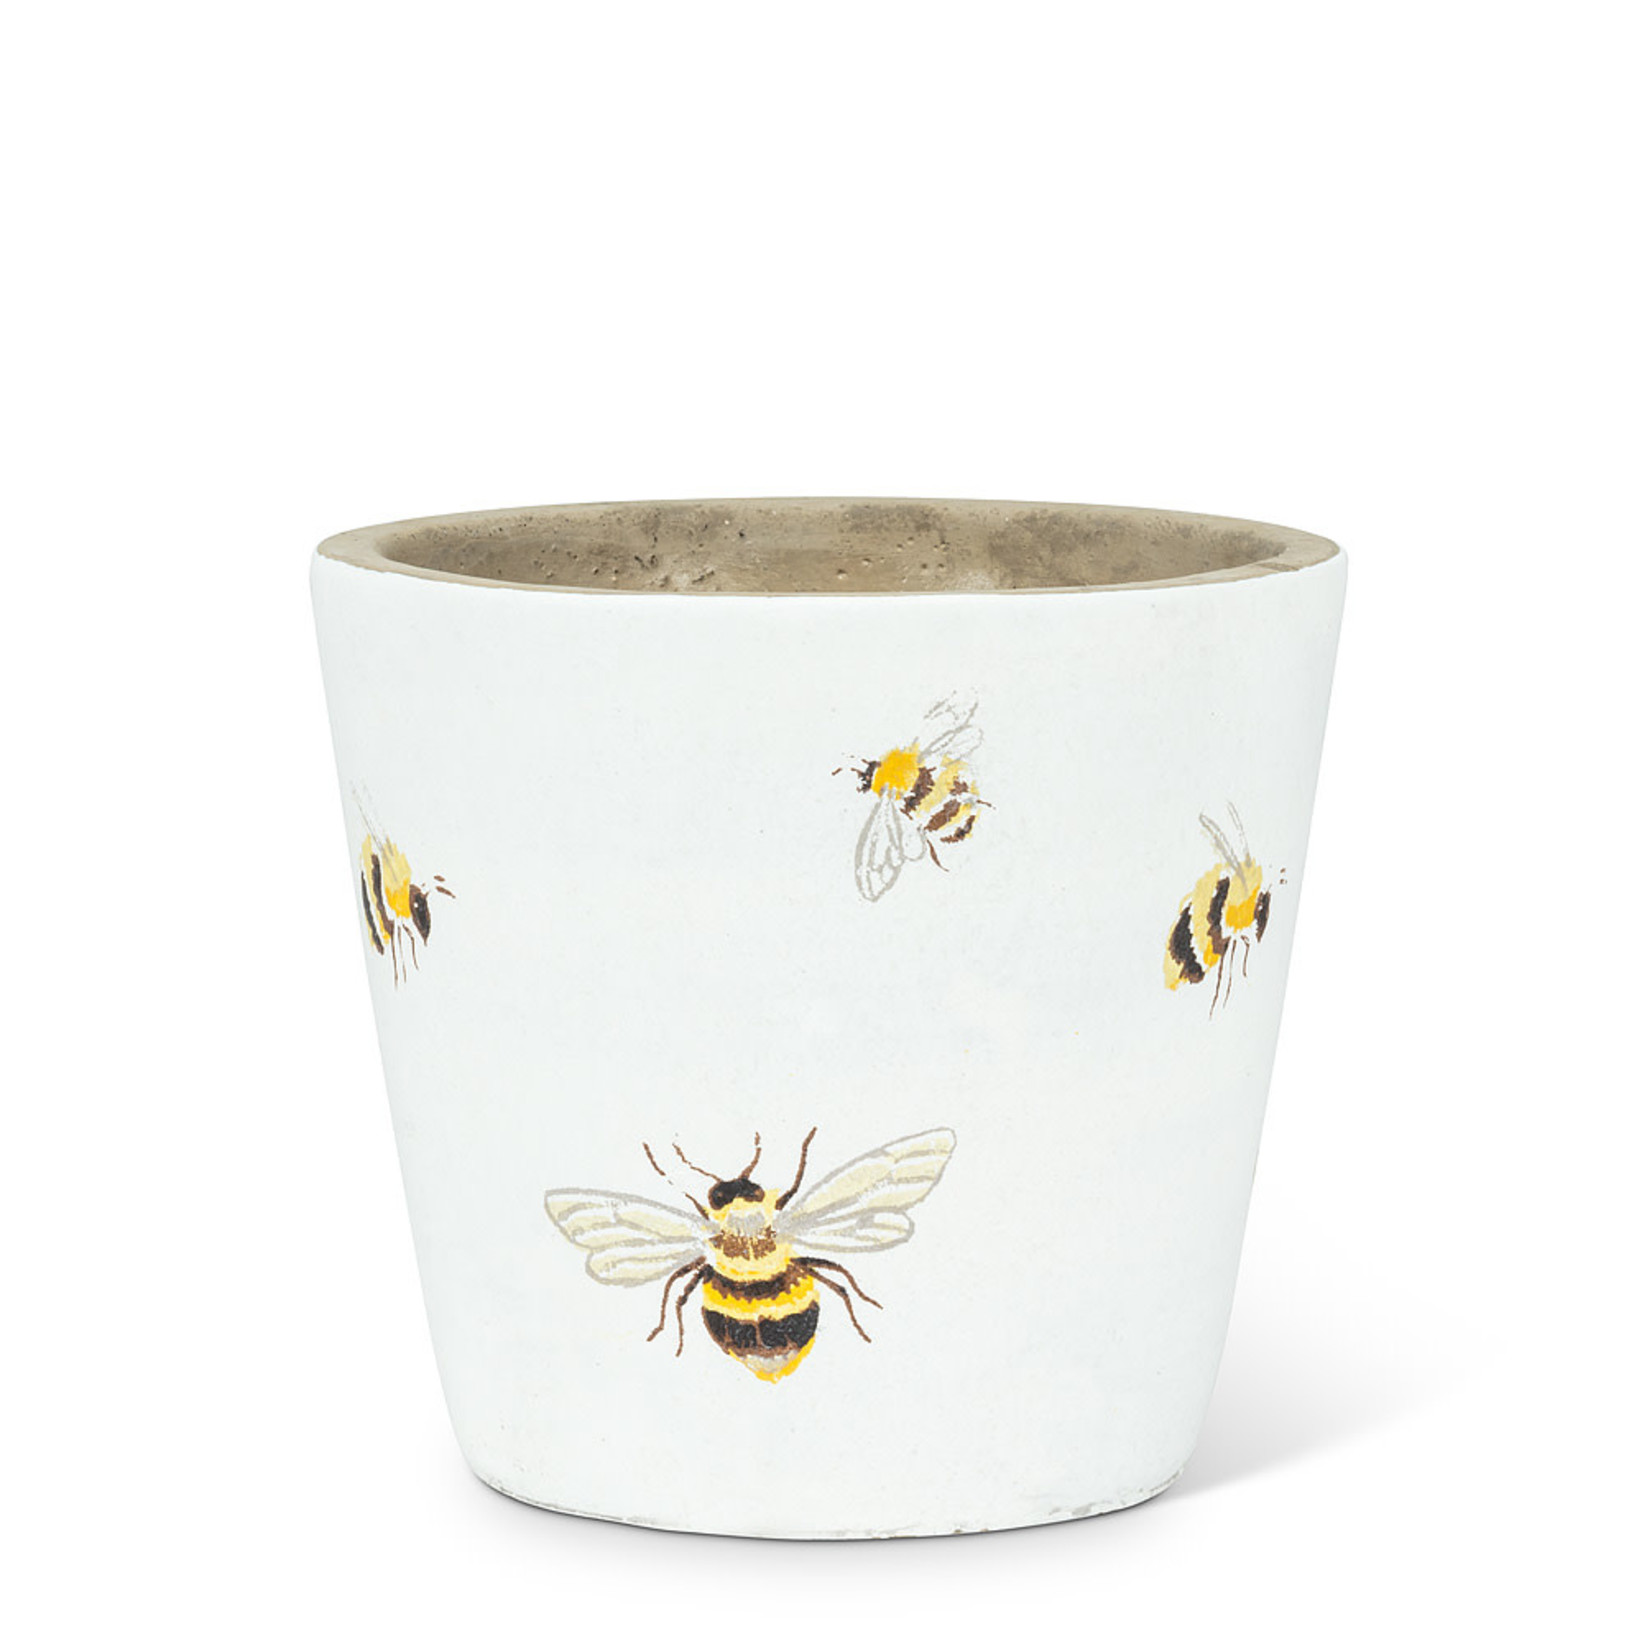 "Bee Planter - Flying XSm 3 ""H"